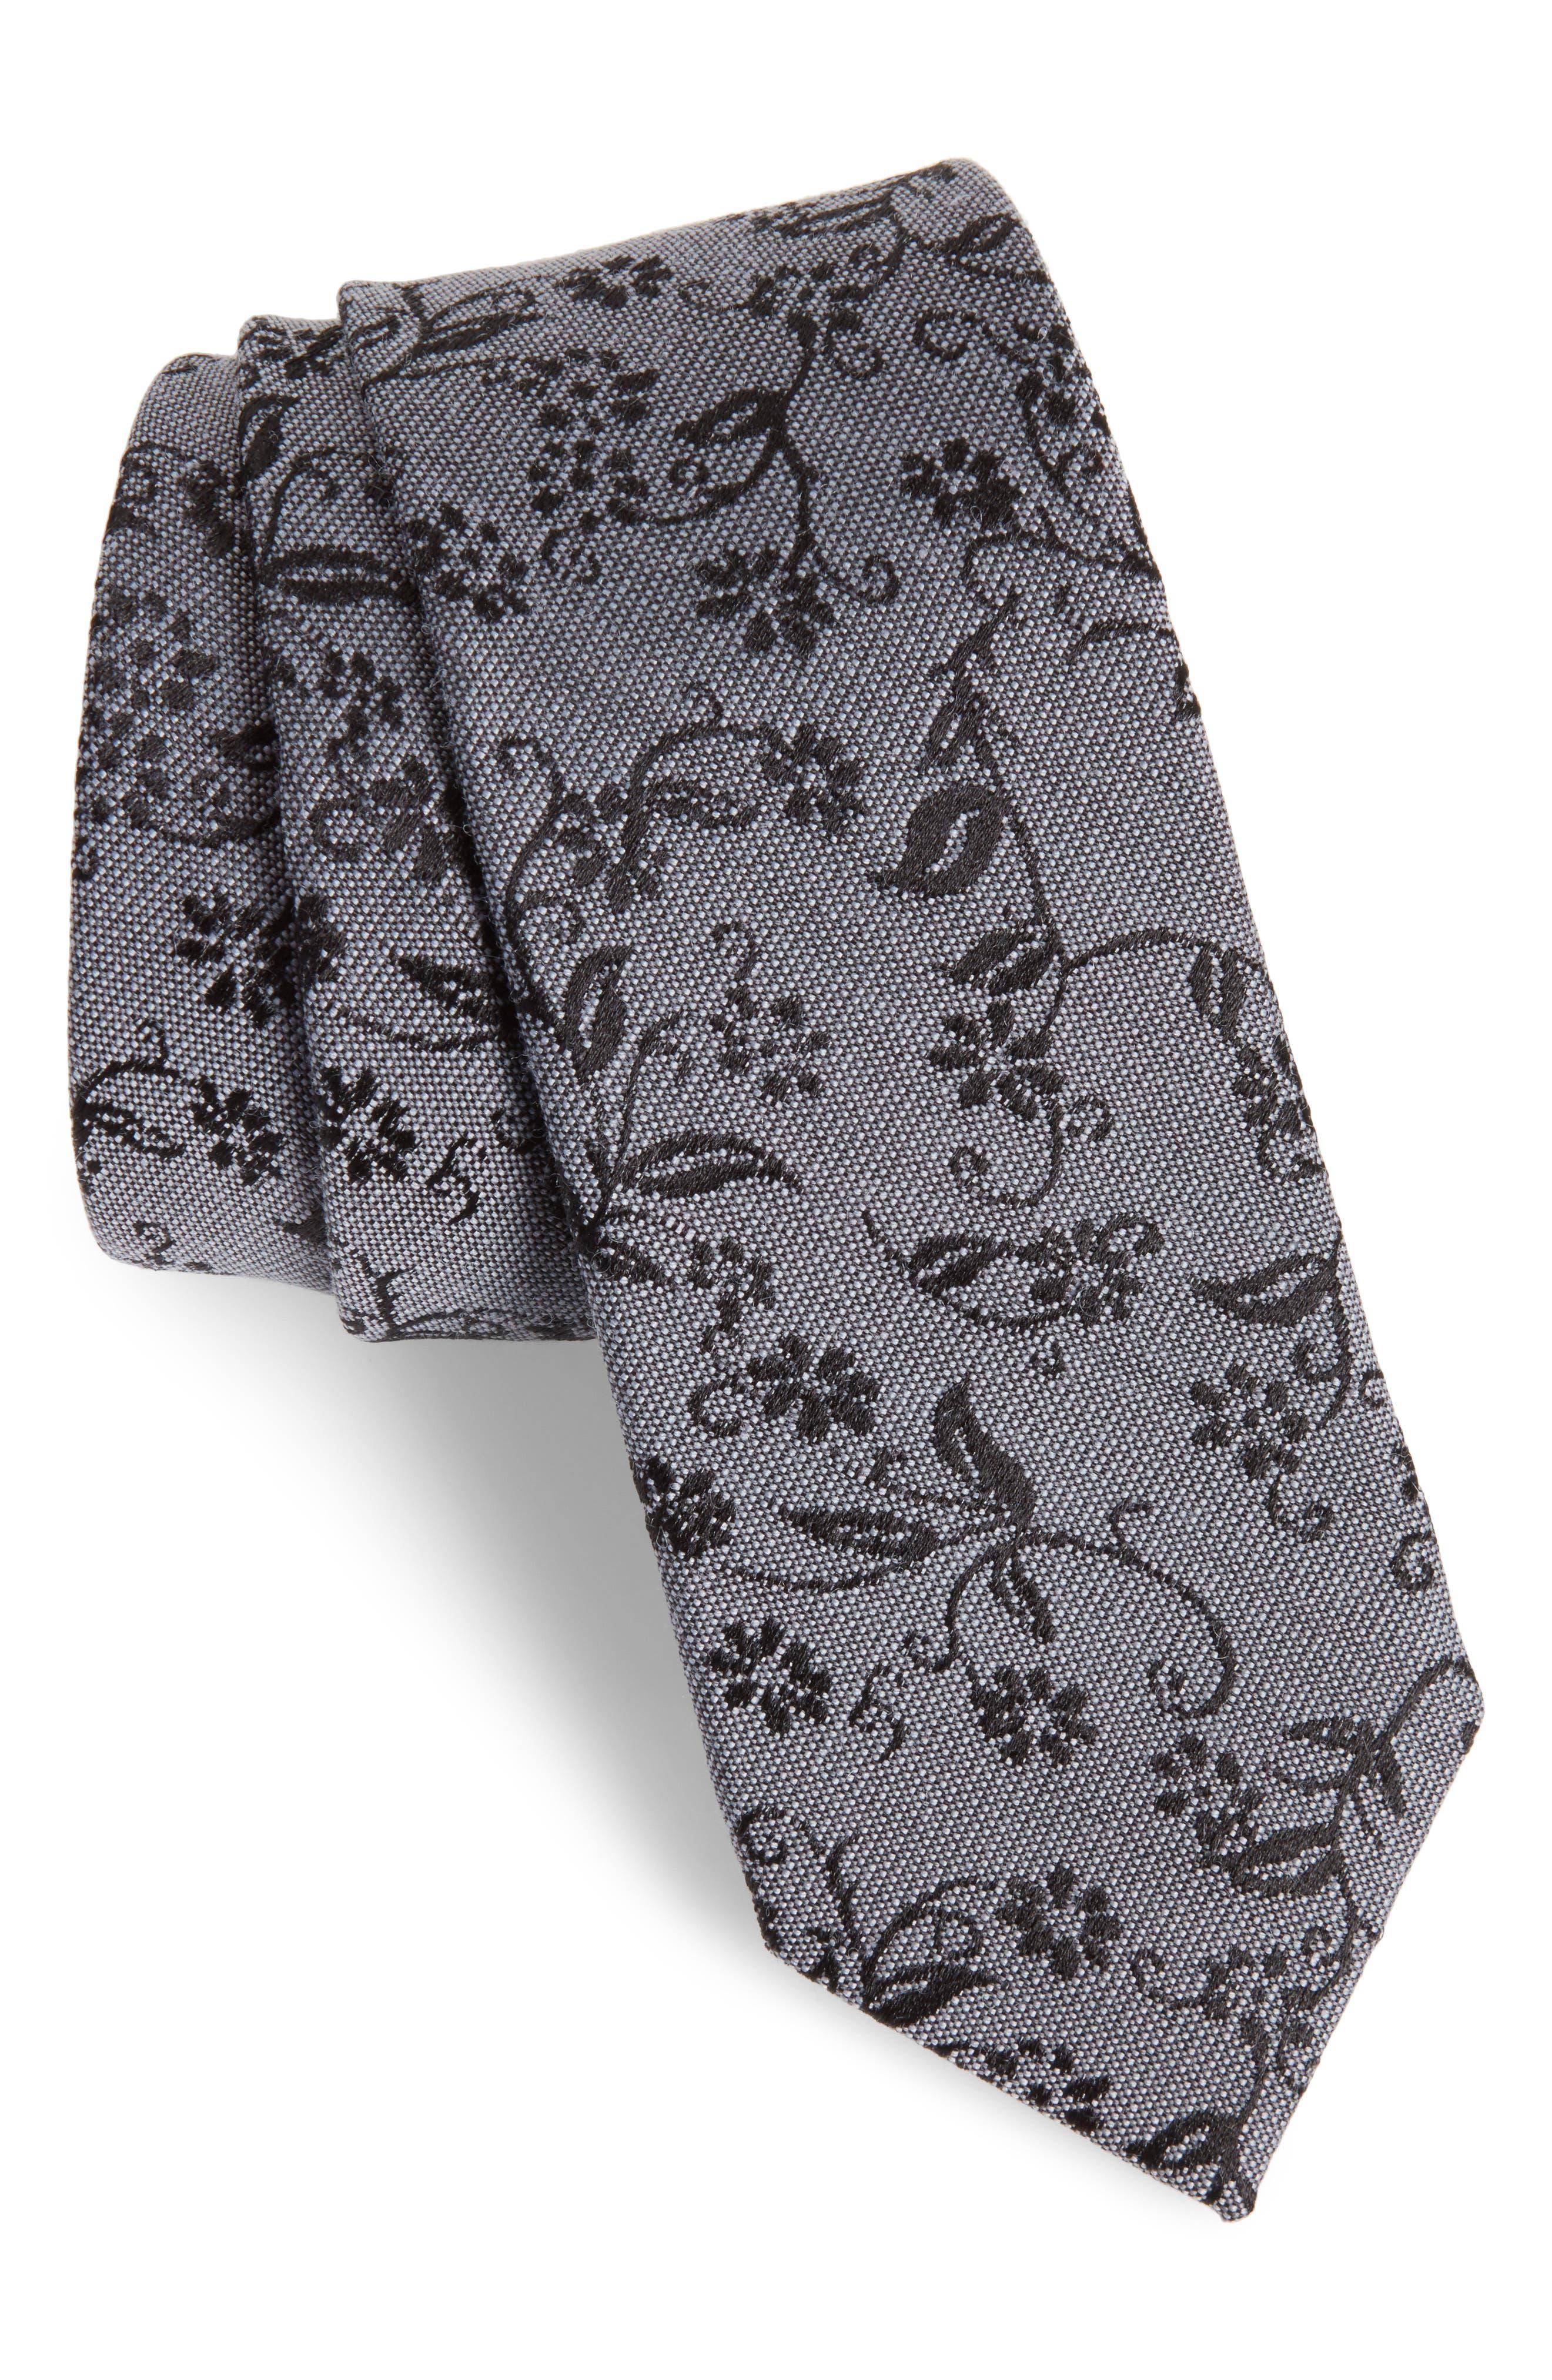 Alternate Image 1 Selected - Nordstrom Men's Shop Emerson Floral Wool & Silk Tie